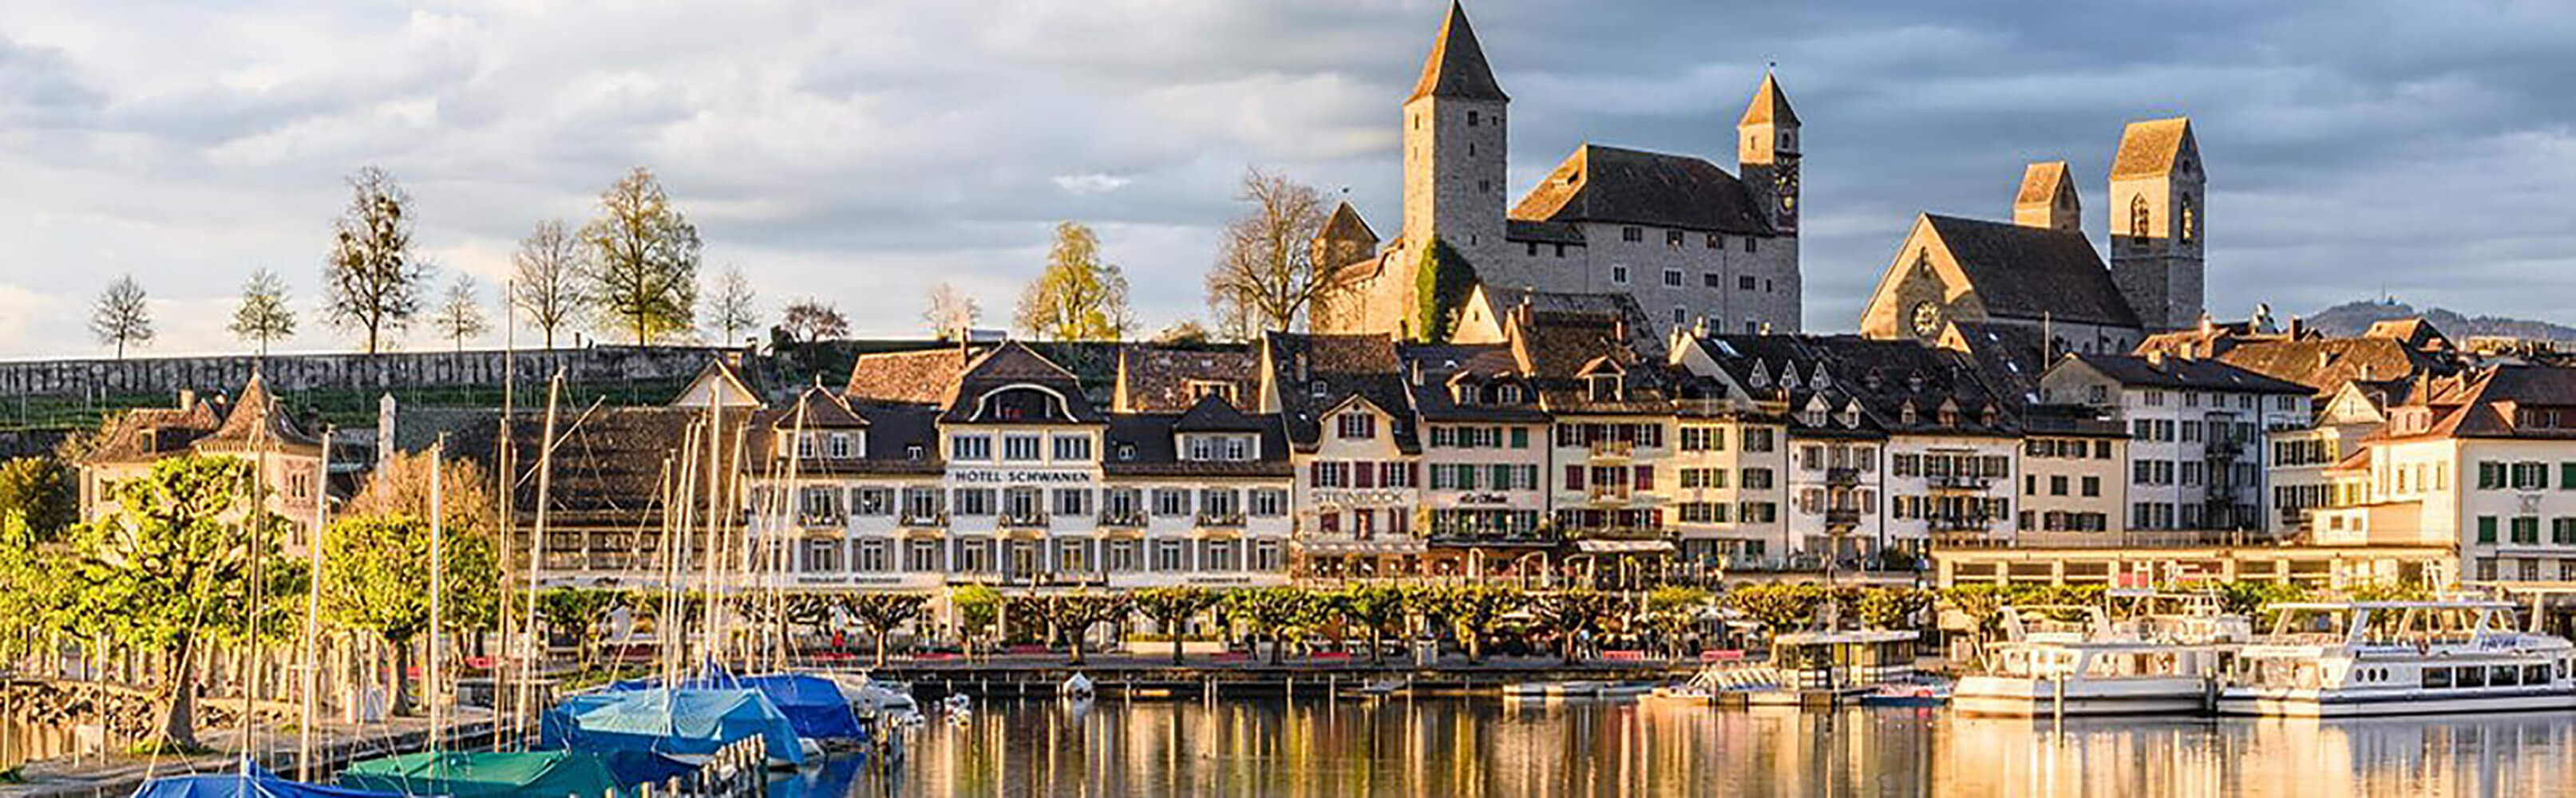 Rapperswil-Jona am Zürichsee 1